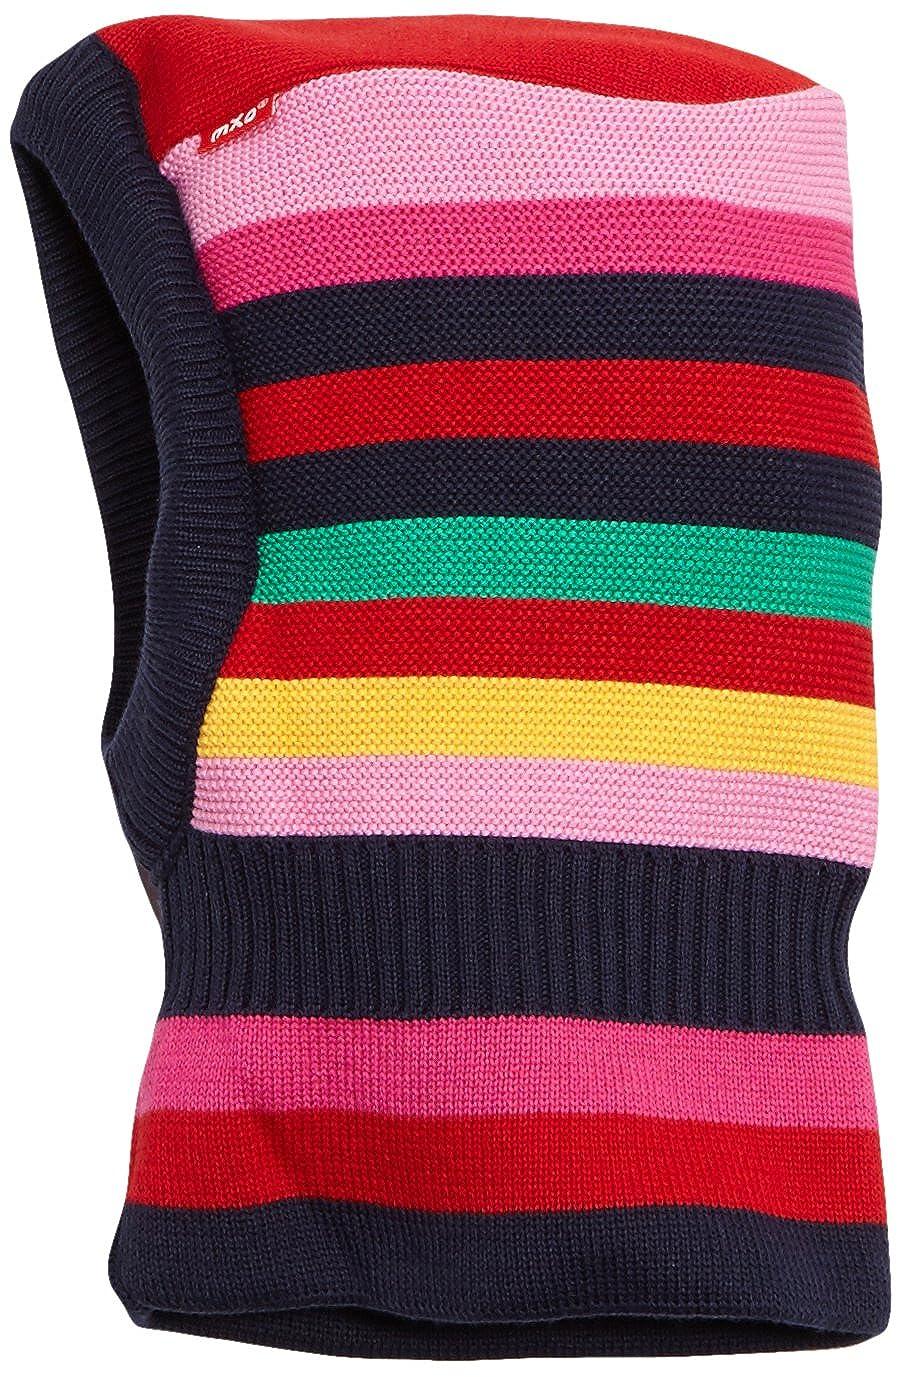 aeae8e85f Amazon.com: Maximo Childrens Infant Baby Winter Hat Warm Colored ...